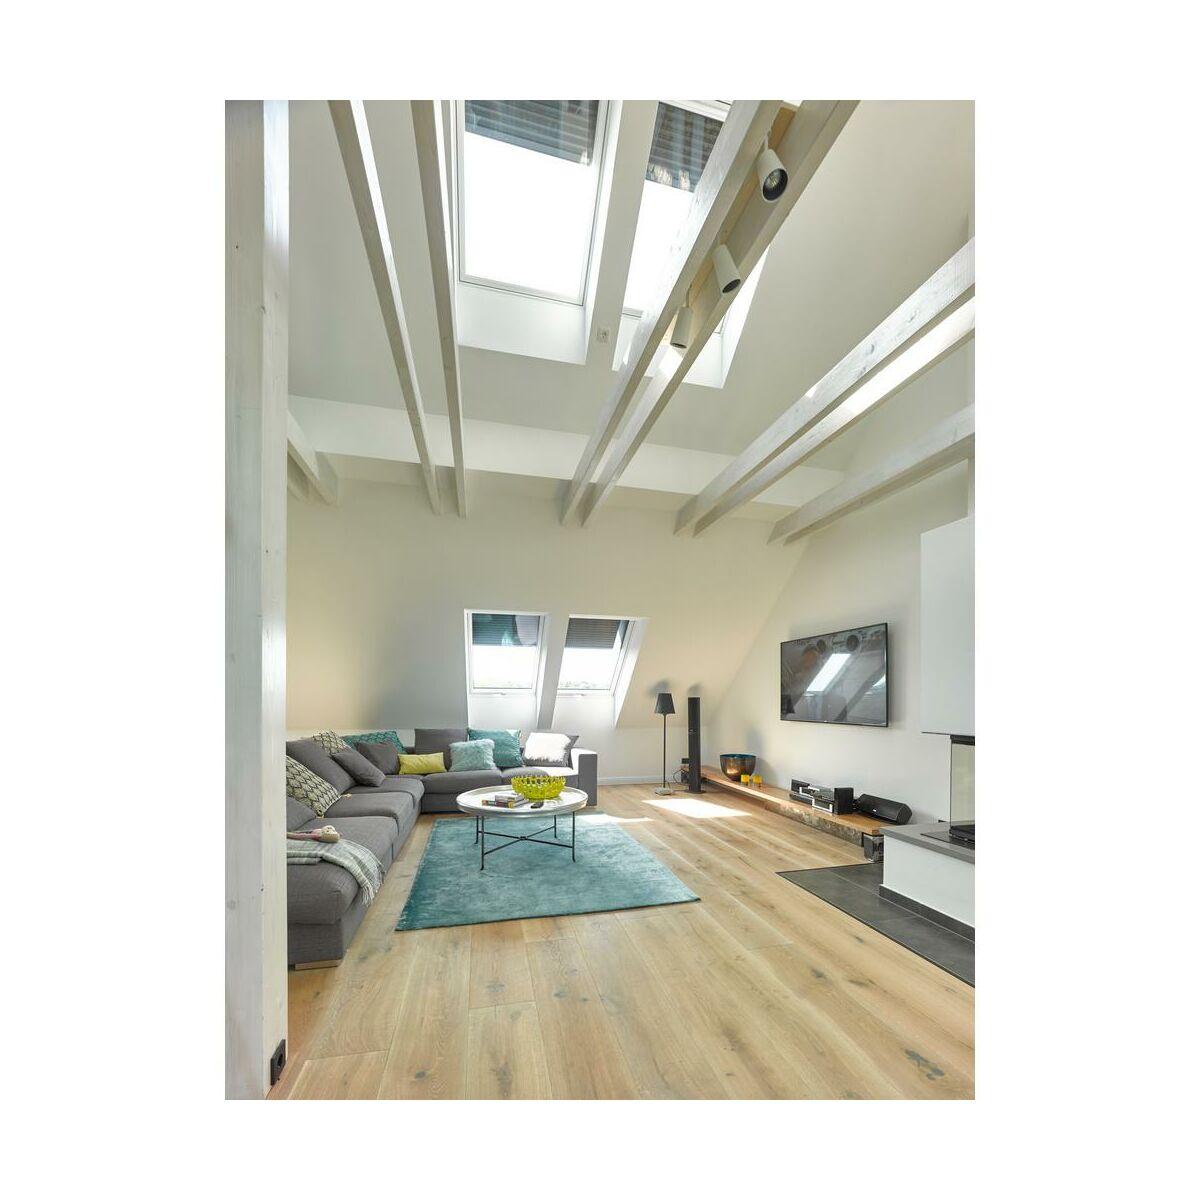 okno dachowe gpu pk08 0066 140x94 cm velux okna dachowe. Black Bedroom Furniture Sets. Home Design Ideas